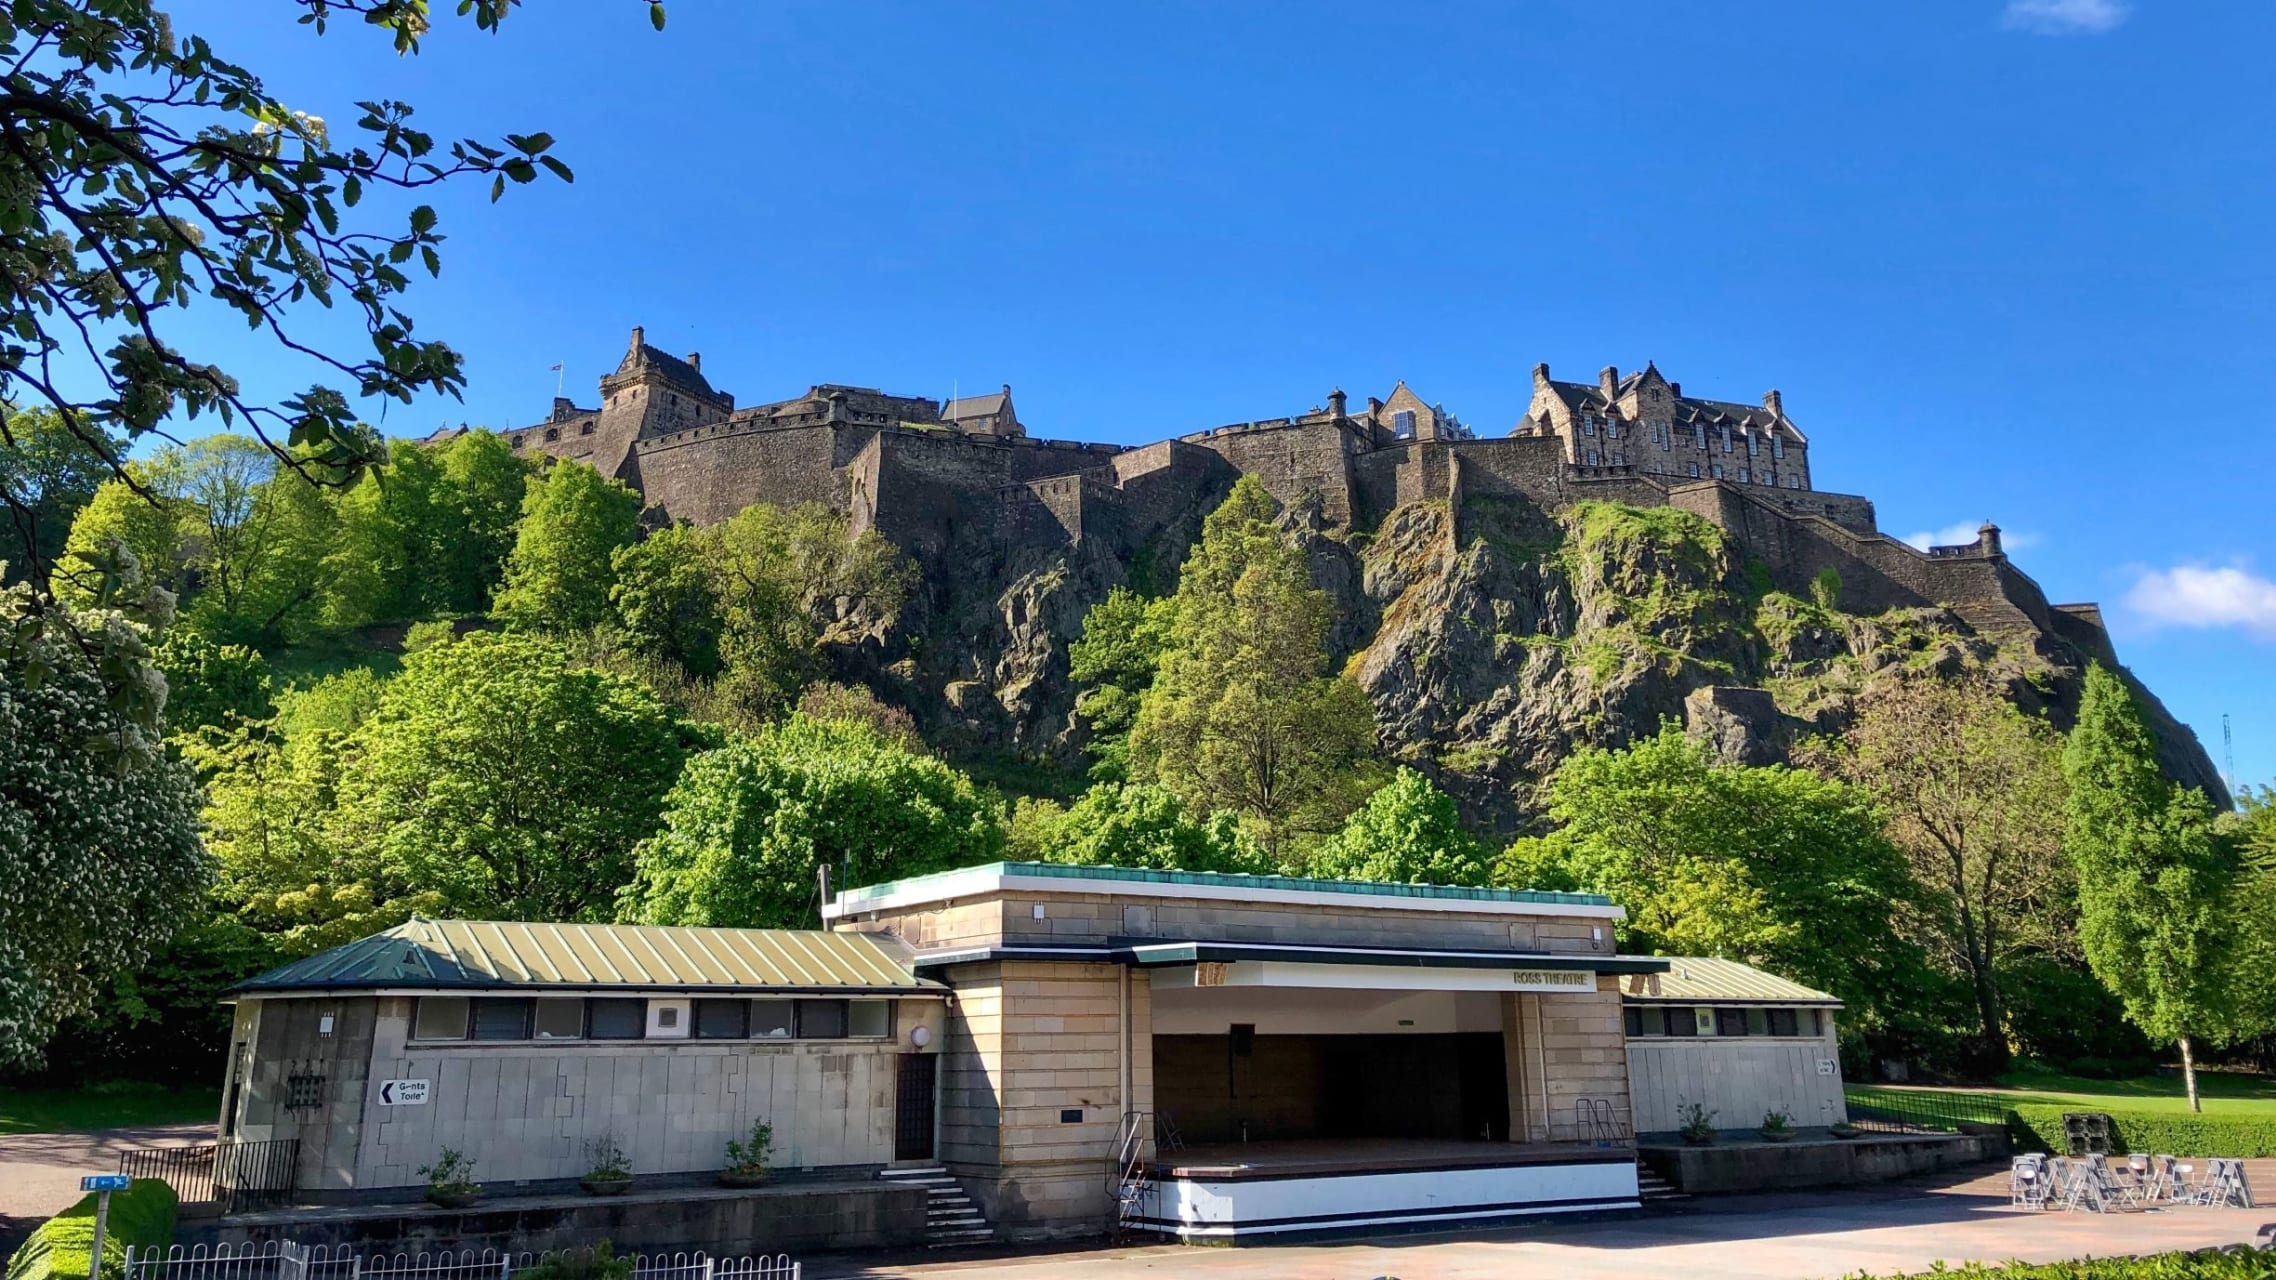 Edinburgh - Edinburgh a Tale of two Towns: Medieval Old Town to Georgian New Town.